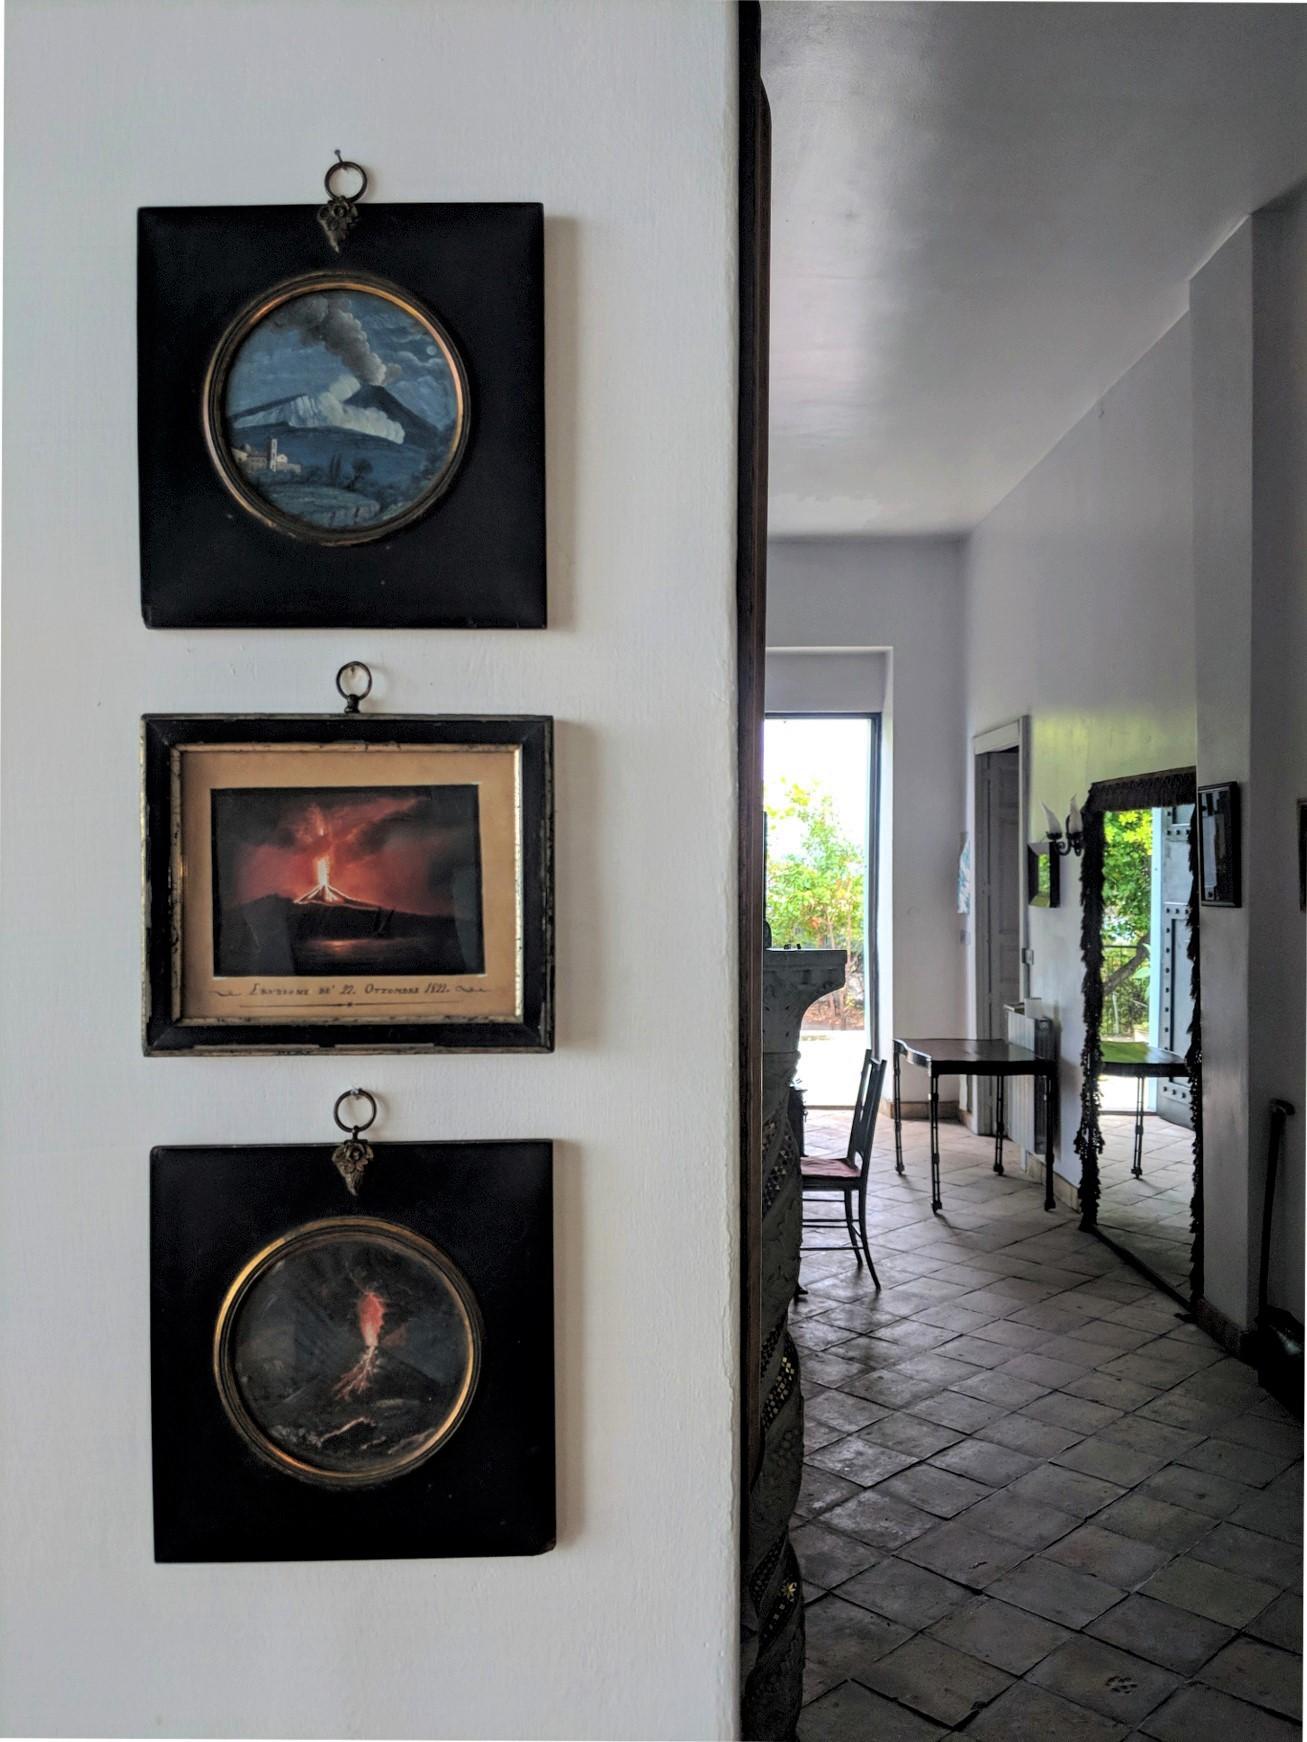 70 gouaches villa ama sicily.jpg